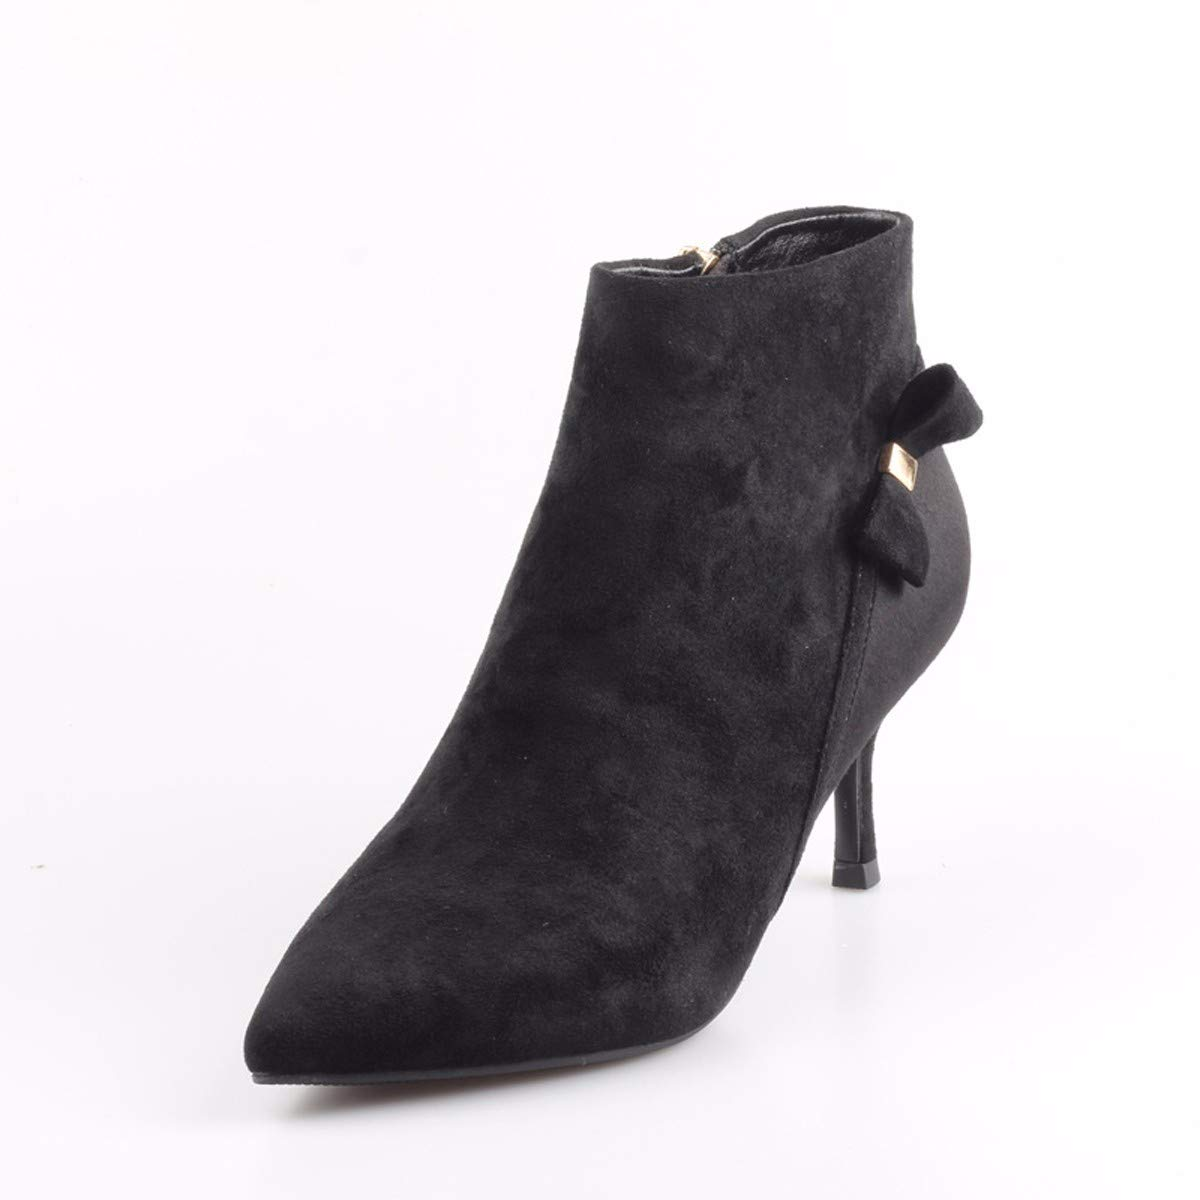 KPHY Damenschuhe Kurze Kurze Kurze Stiefel Mit Hohen 6 cm Dünne Sohle Single - Stiefel Wies Kopf Nahe Bei Seite Reißverschluss Mode Fliege Martin Stiefel. 5ecd01